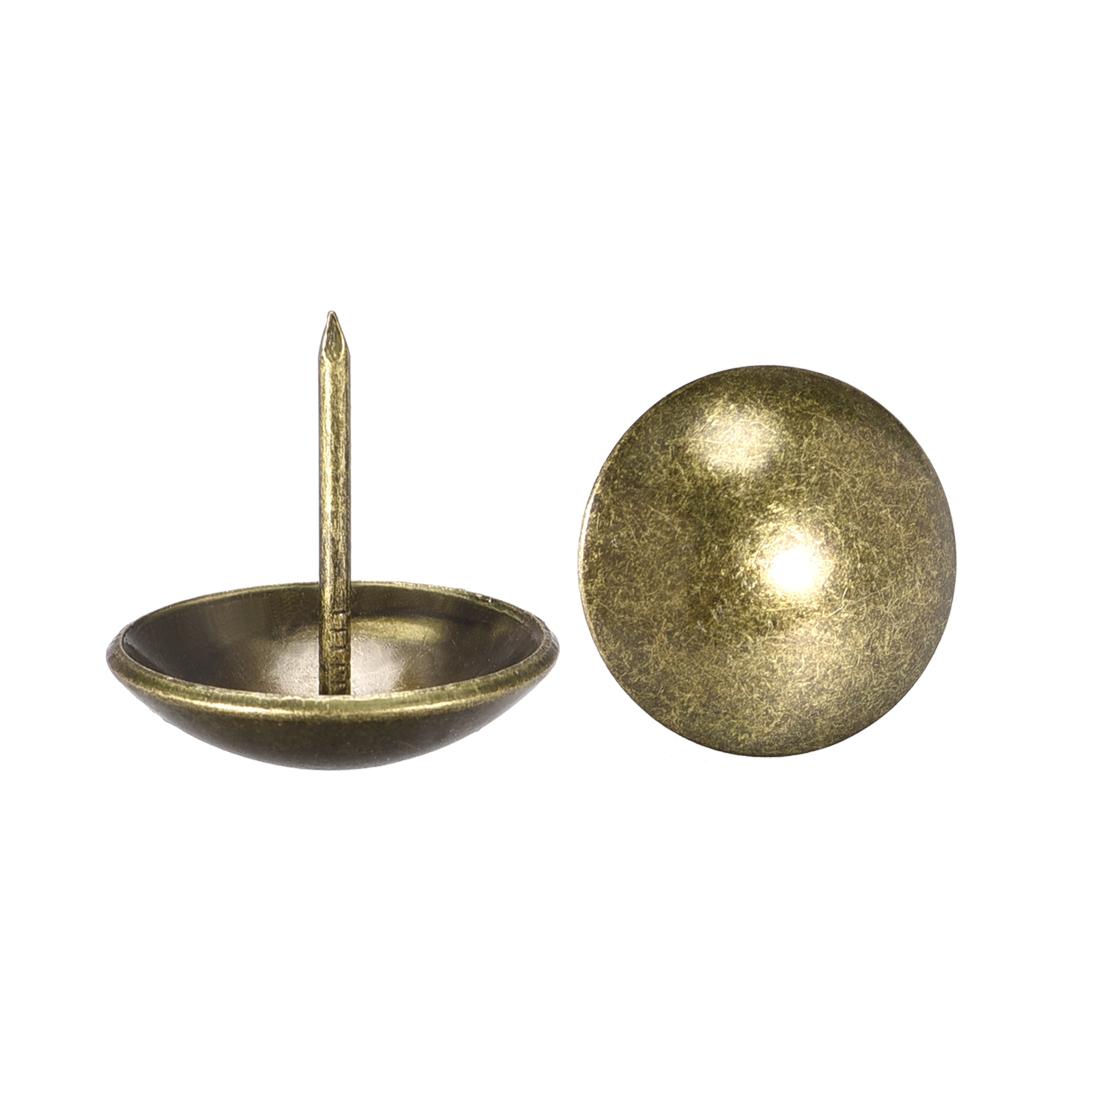 Upholstery Nails Tacks 25mm Dia 25mm Height Round Push Pins Bronze Tone 30 Pcs